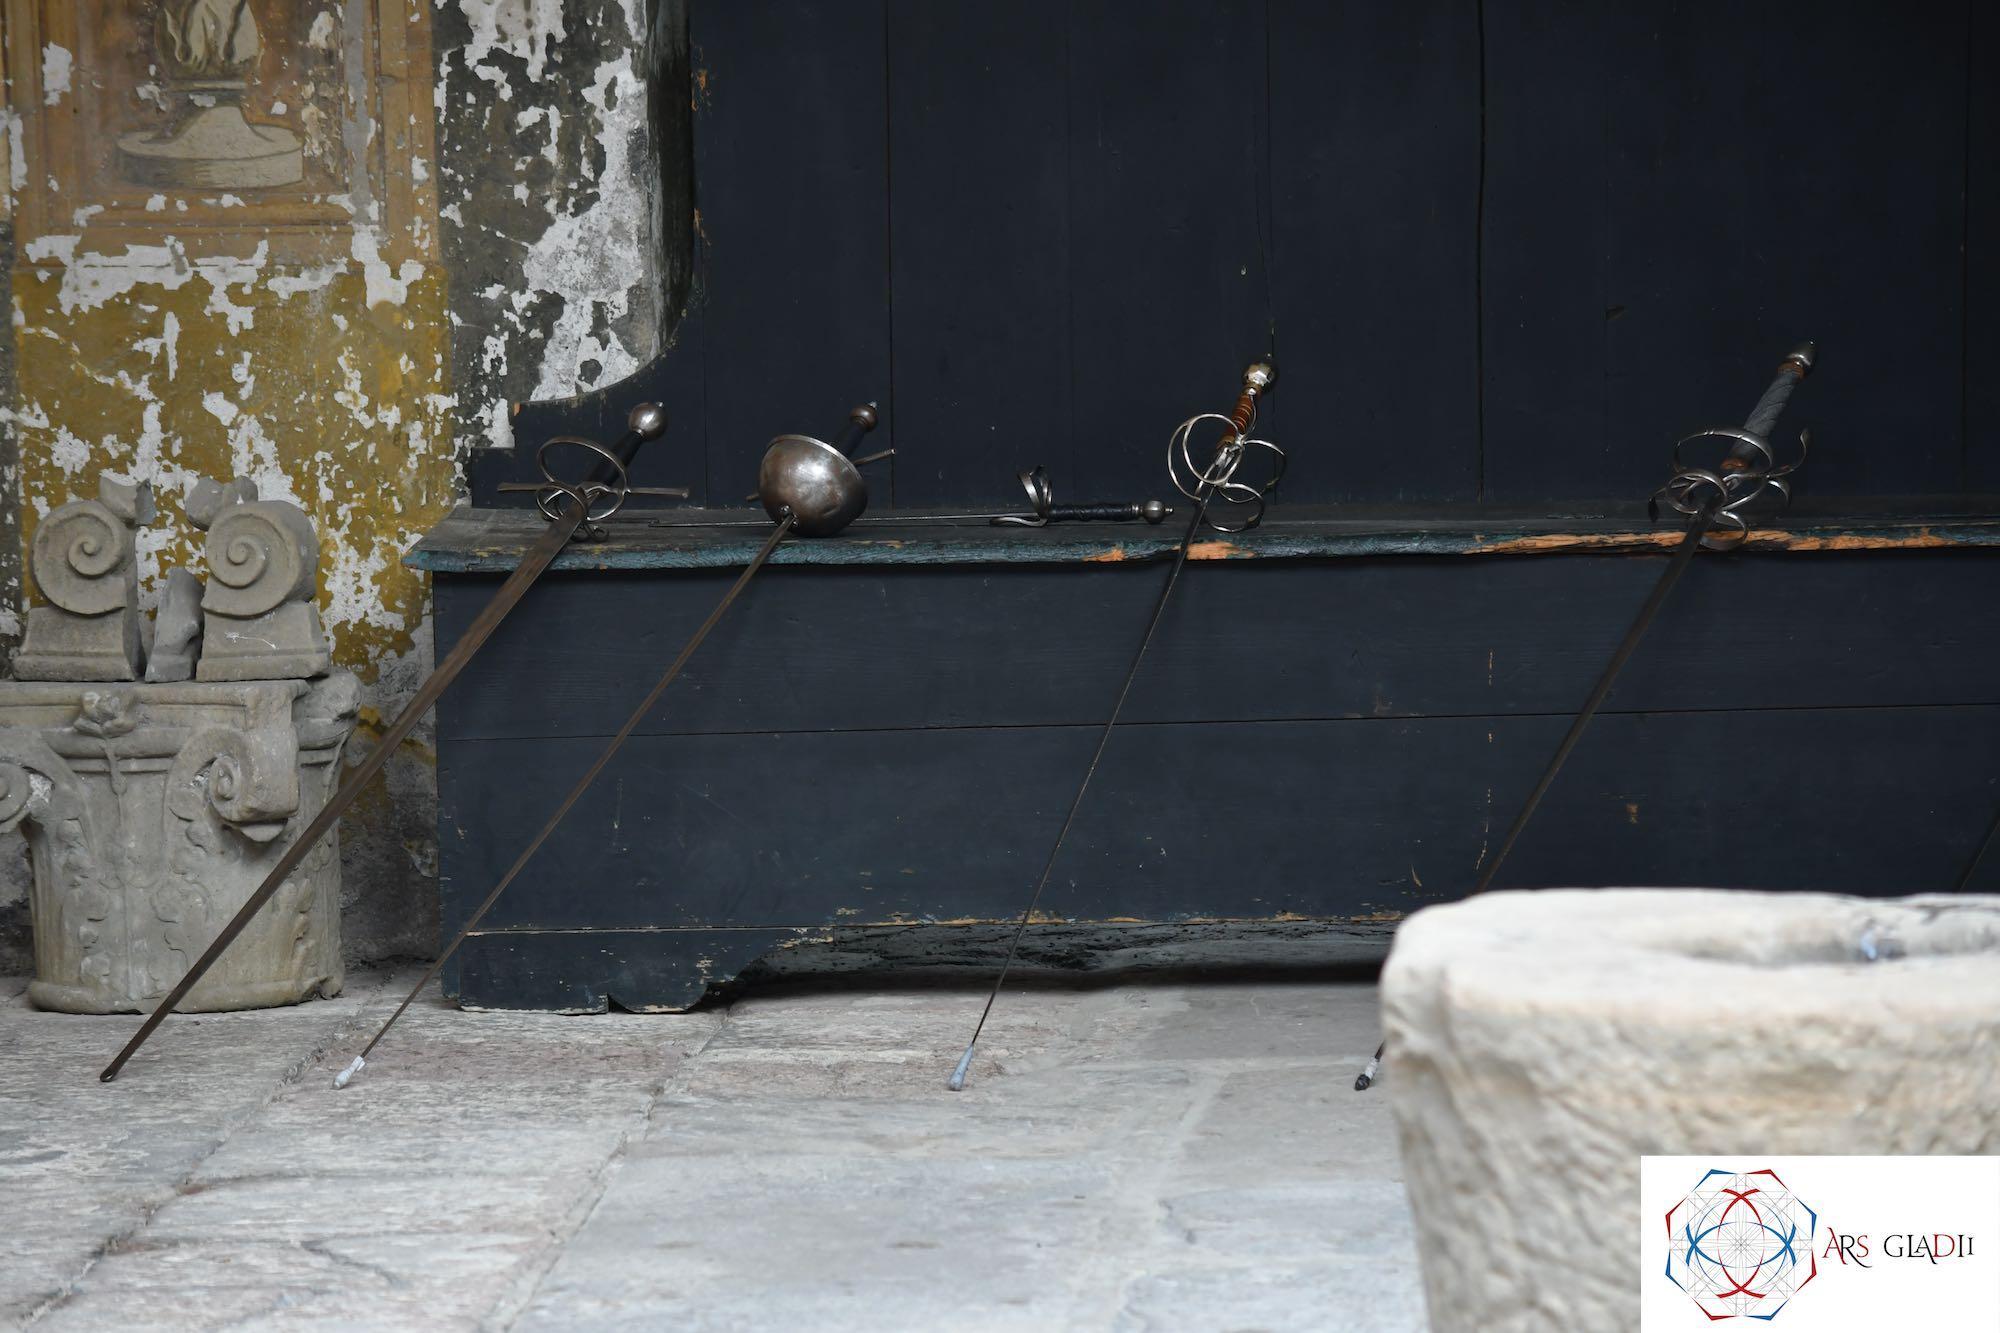 Ars Gladii - Foto materiali 6